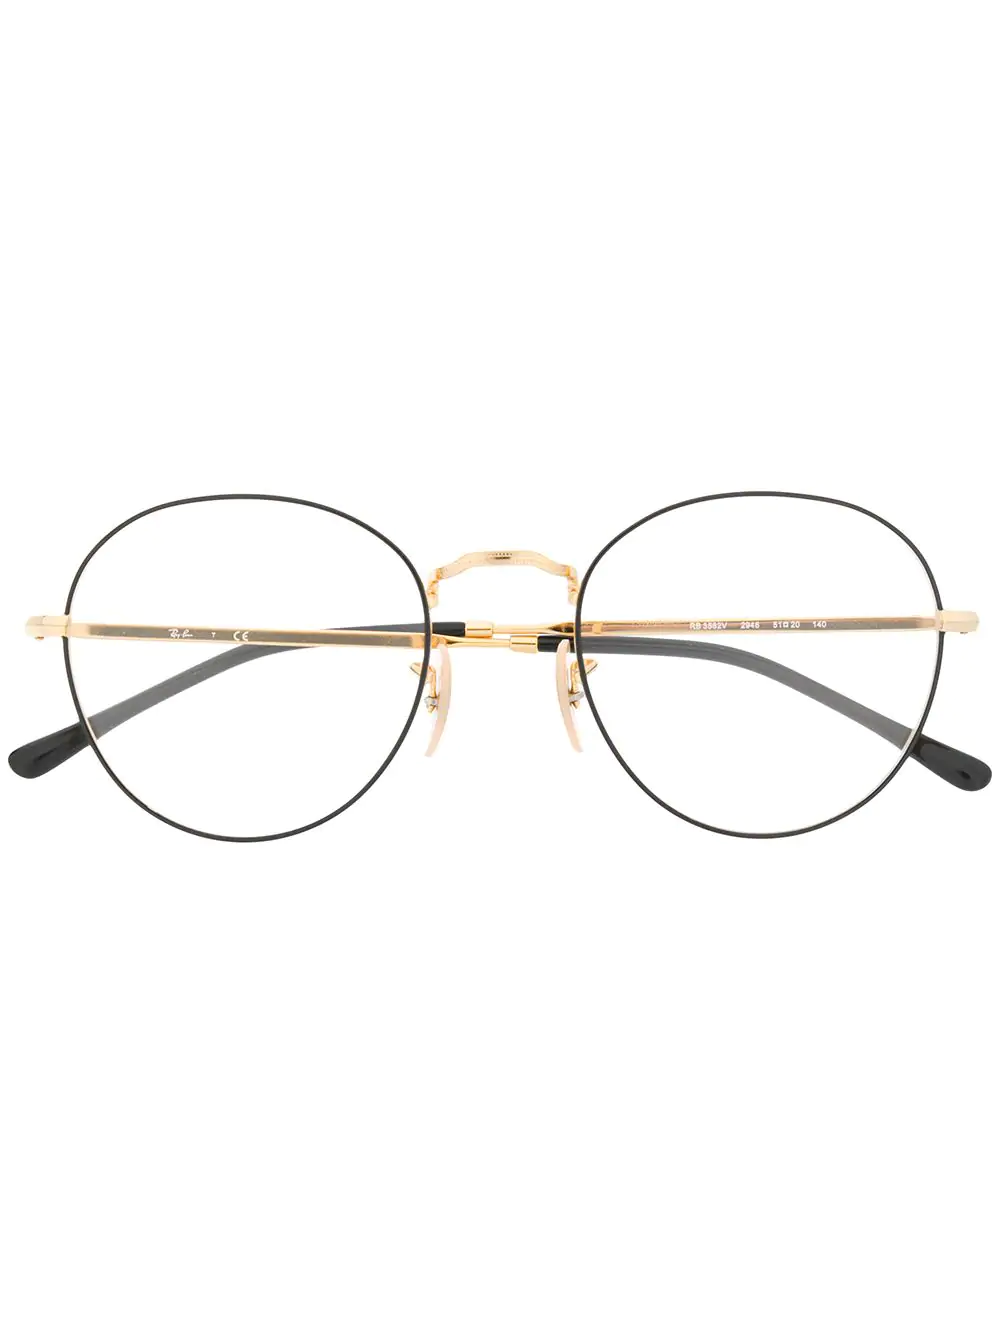 3ad79c8c21cfb Ray Ban Ray-Ban Round Glasses Frames - Gold